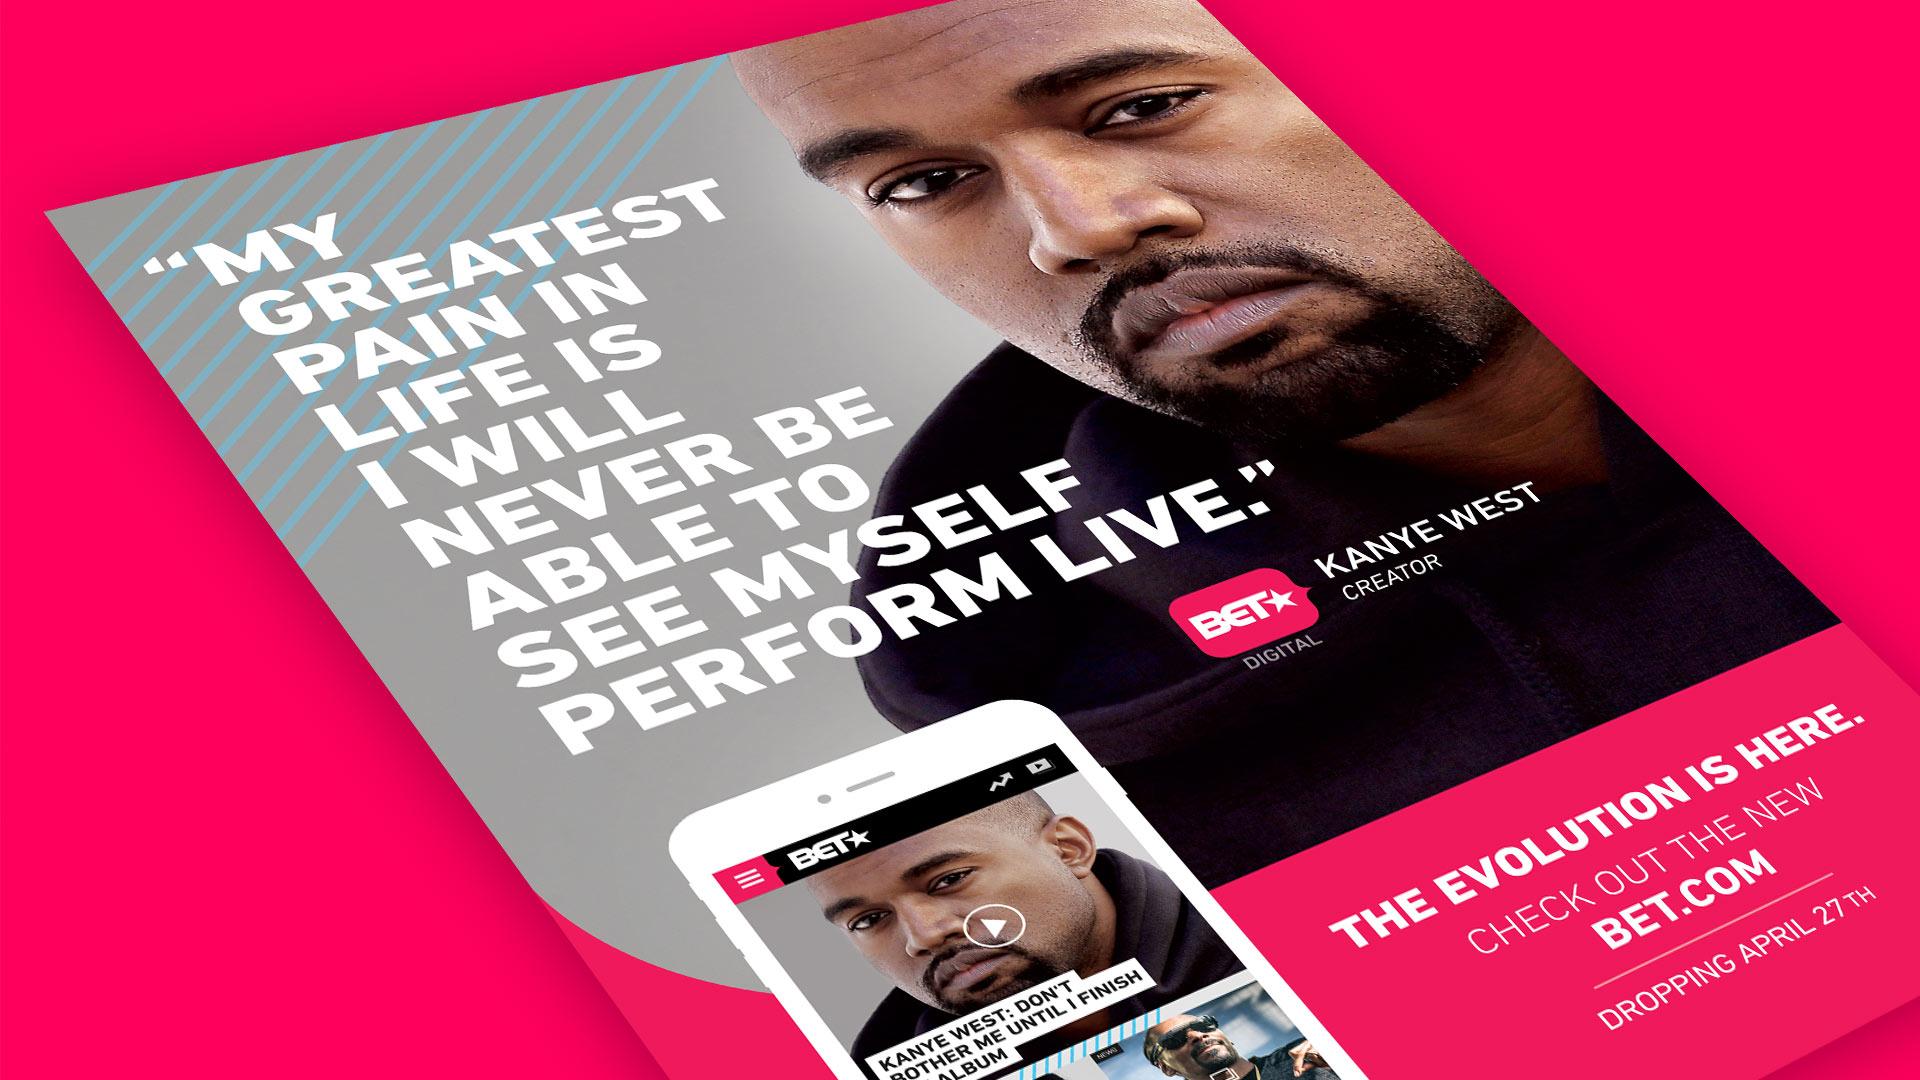 TJI_Piece1_Poster_Gallery_Kanye.jpg